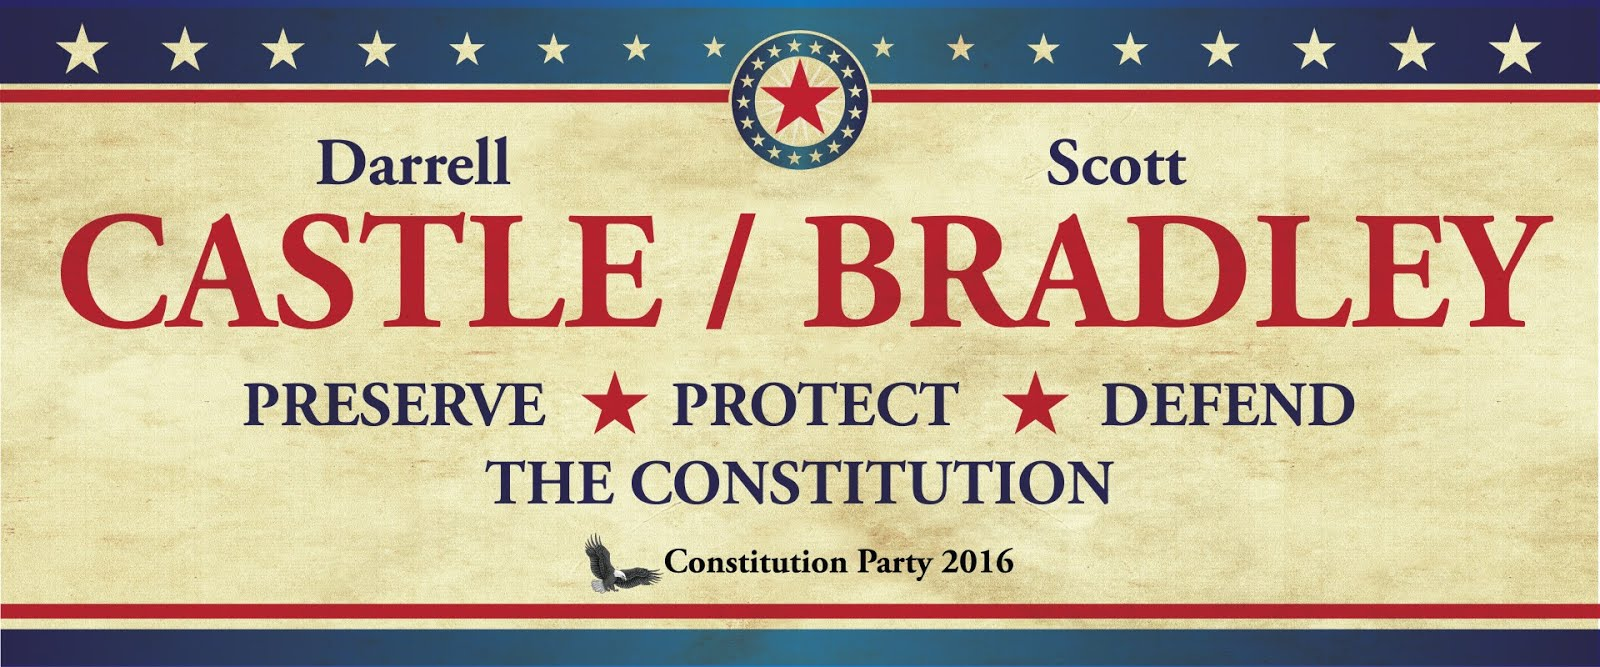 Preserve liberty